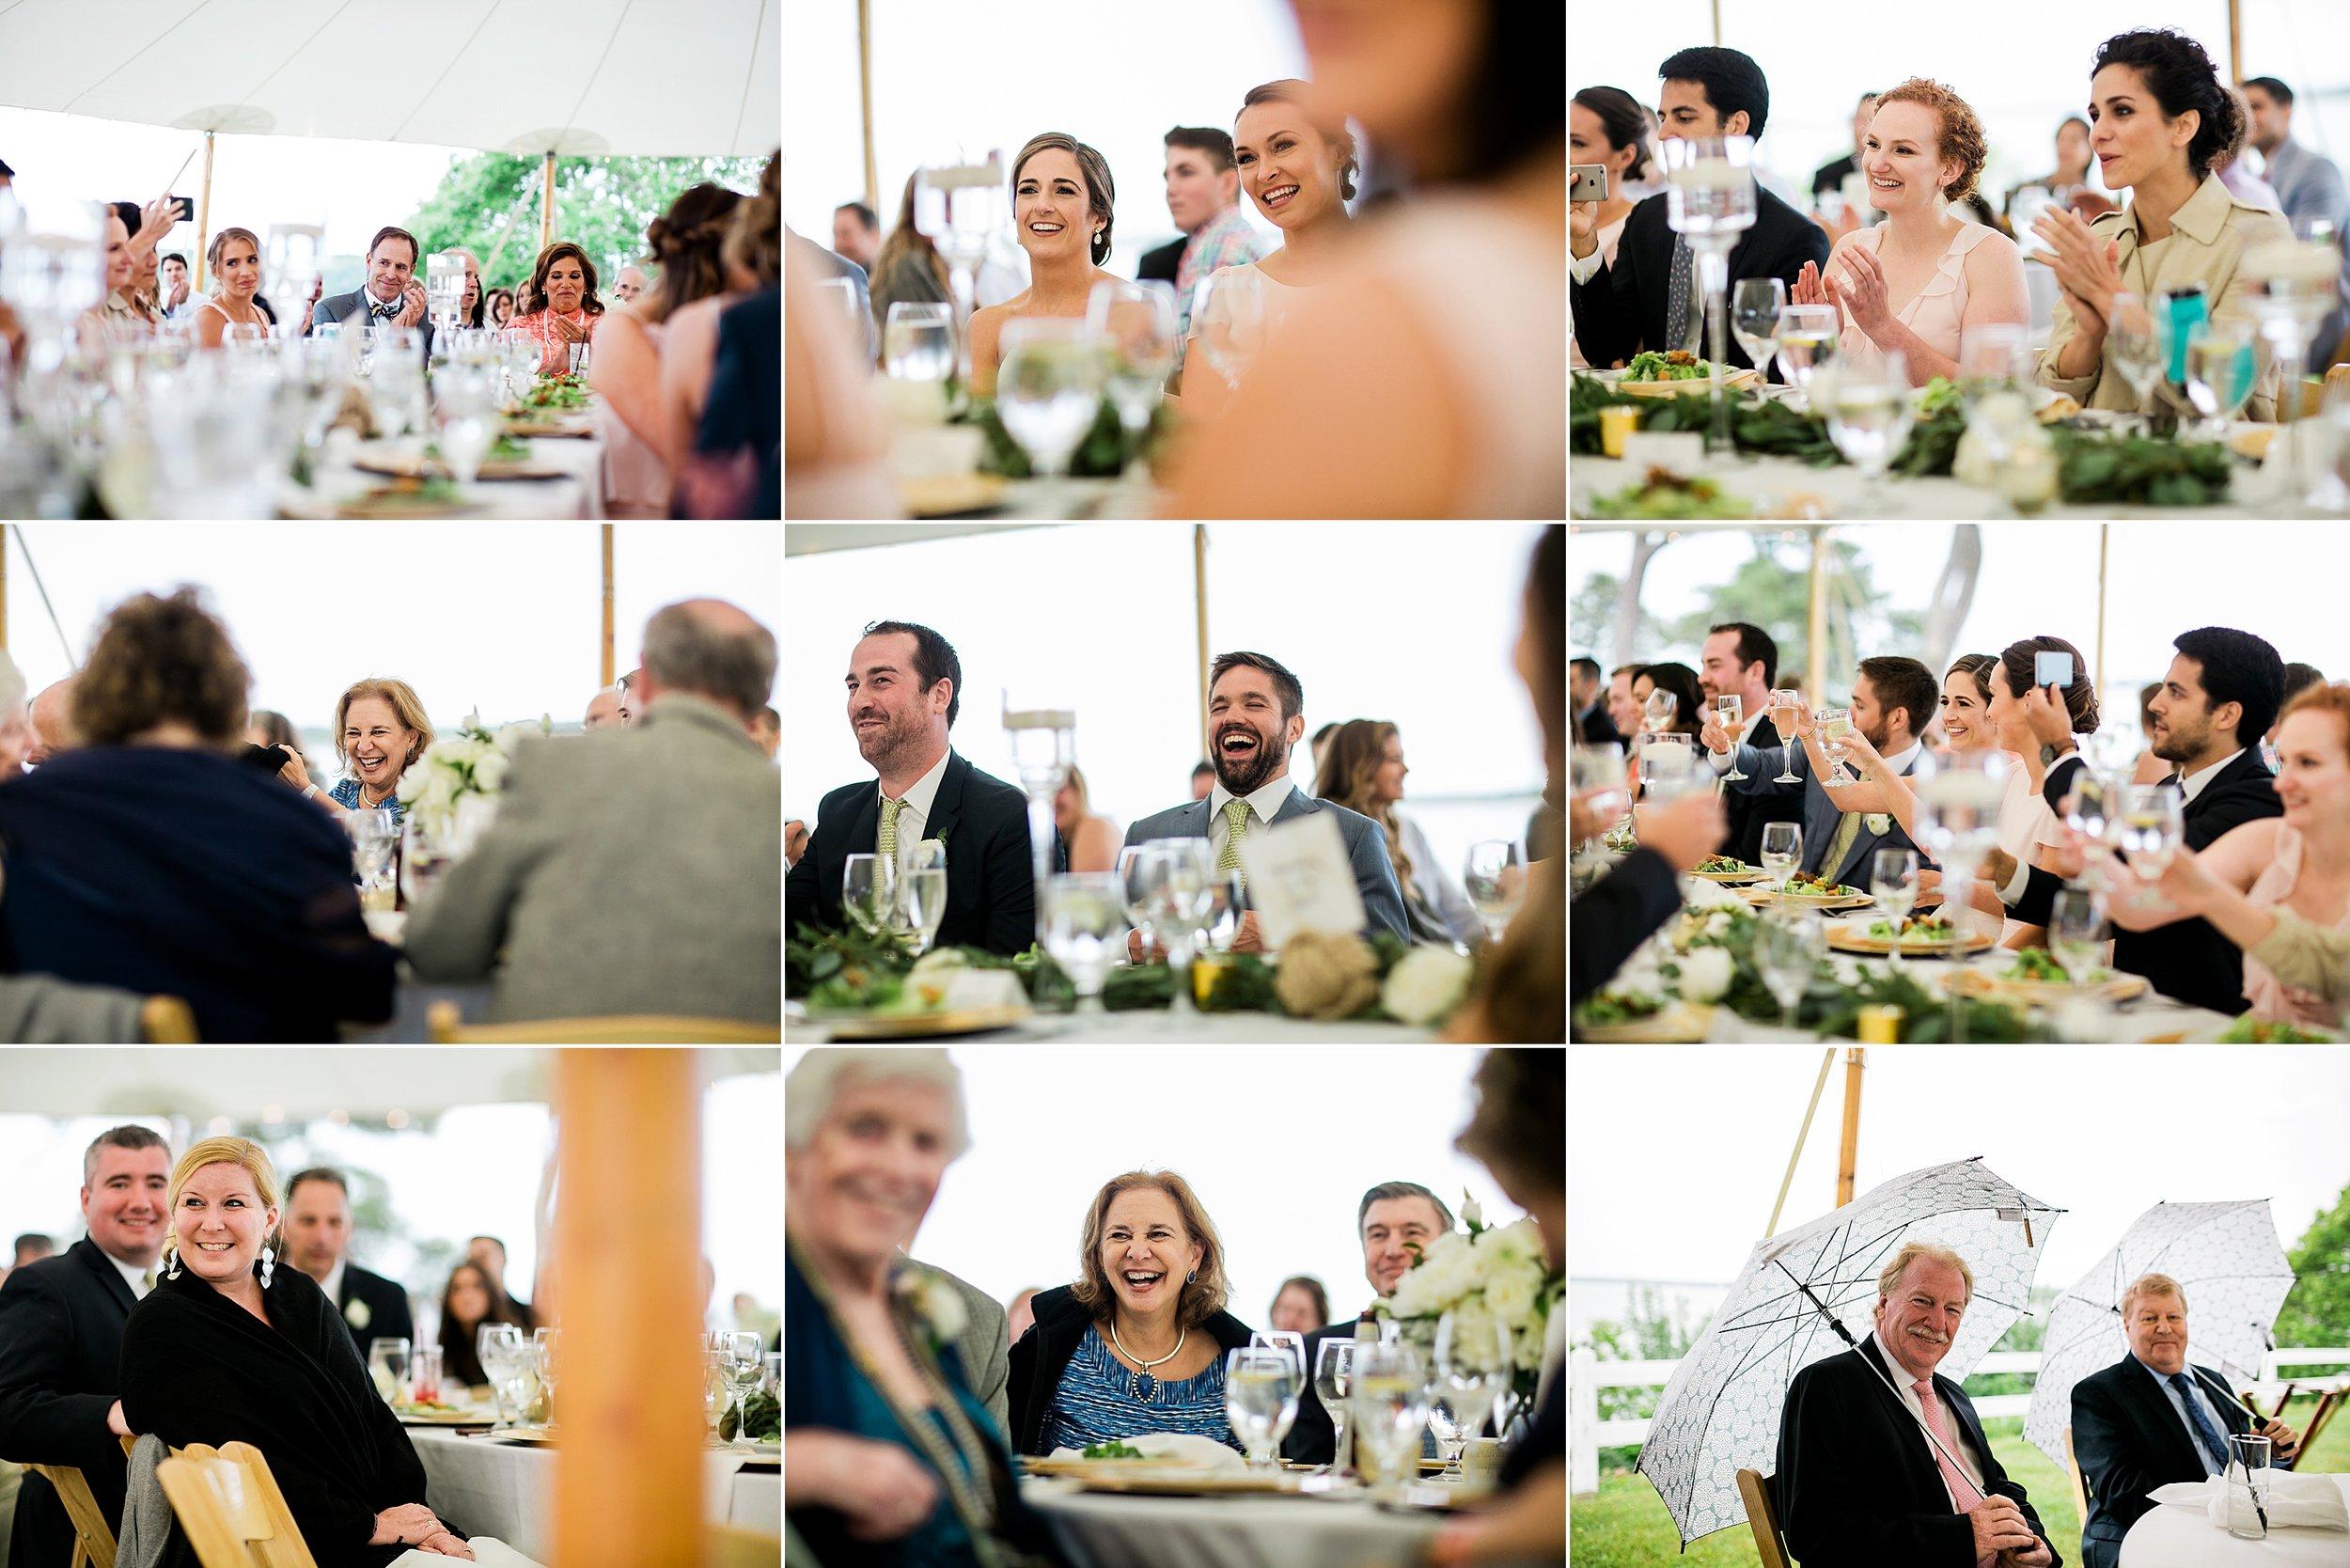 059 los angeles wedding photographer todd danforth photography cape cod.jpg